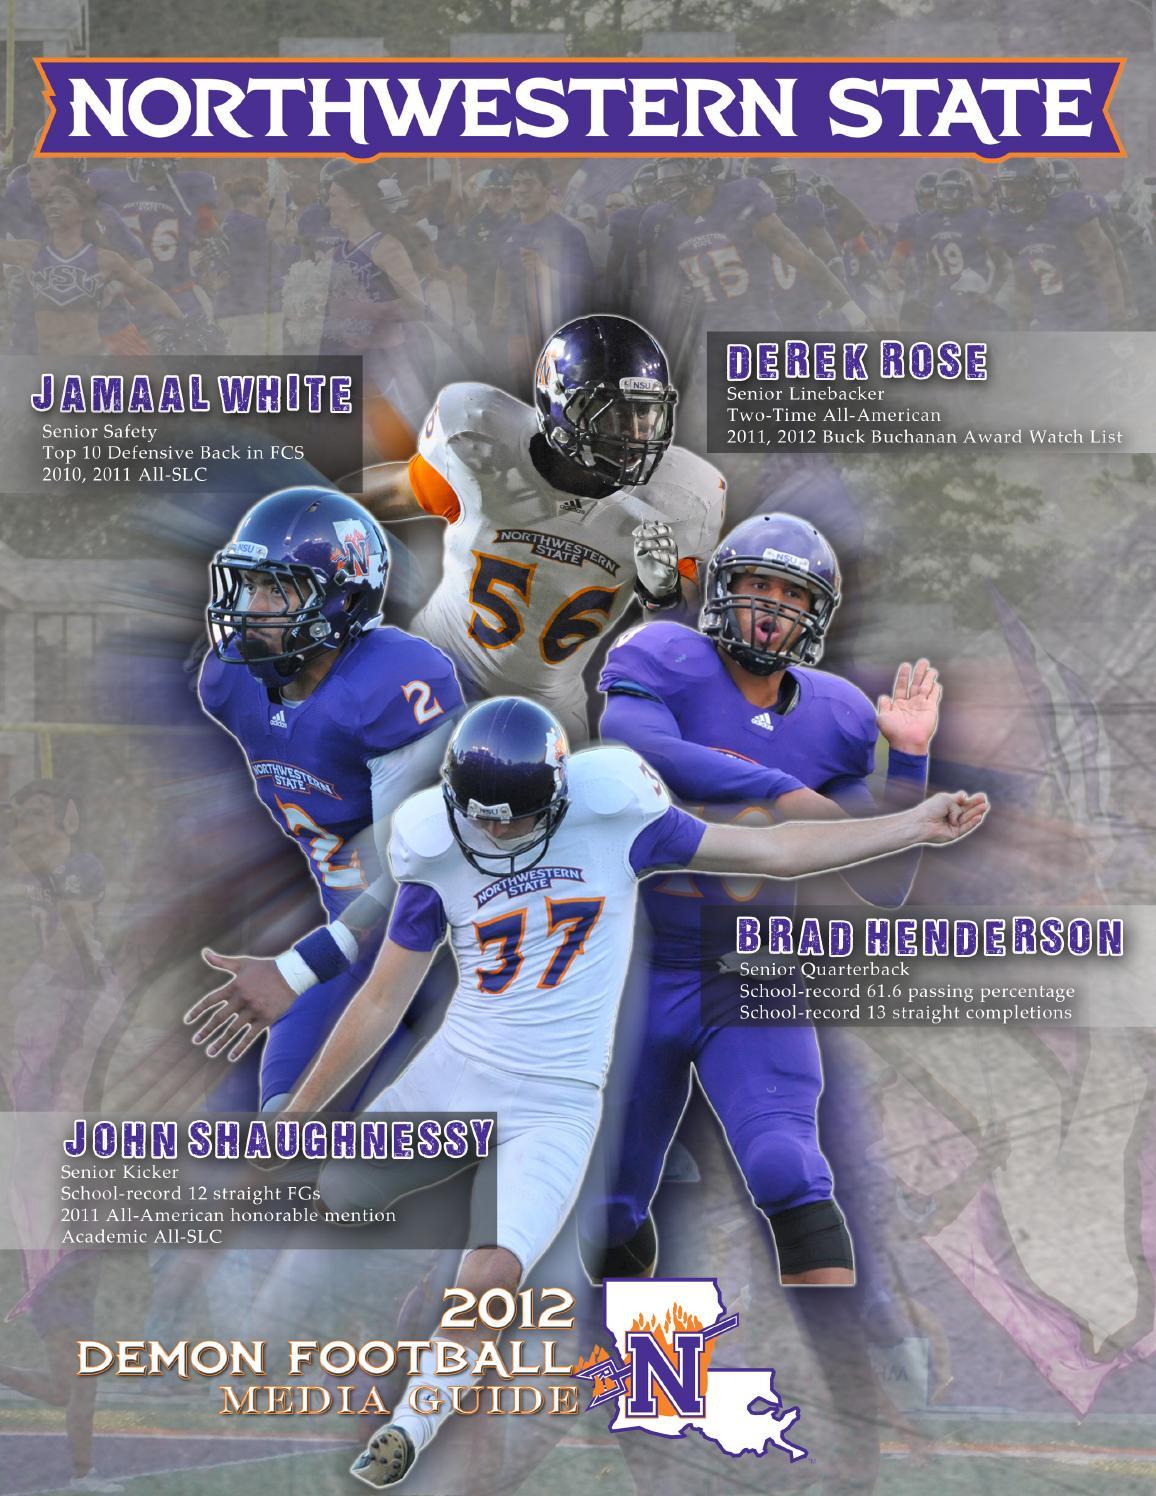 2012 Northwestern State Football Media Guide by Matthew Fowler - issuu b1bb83612